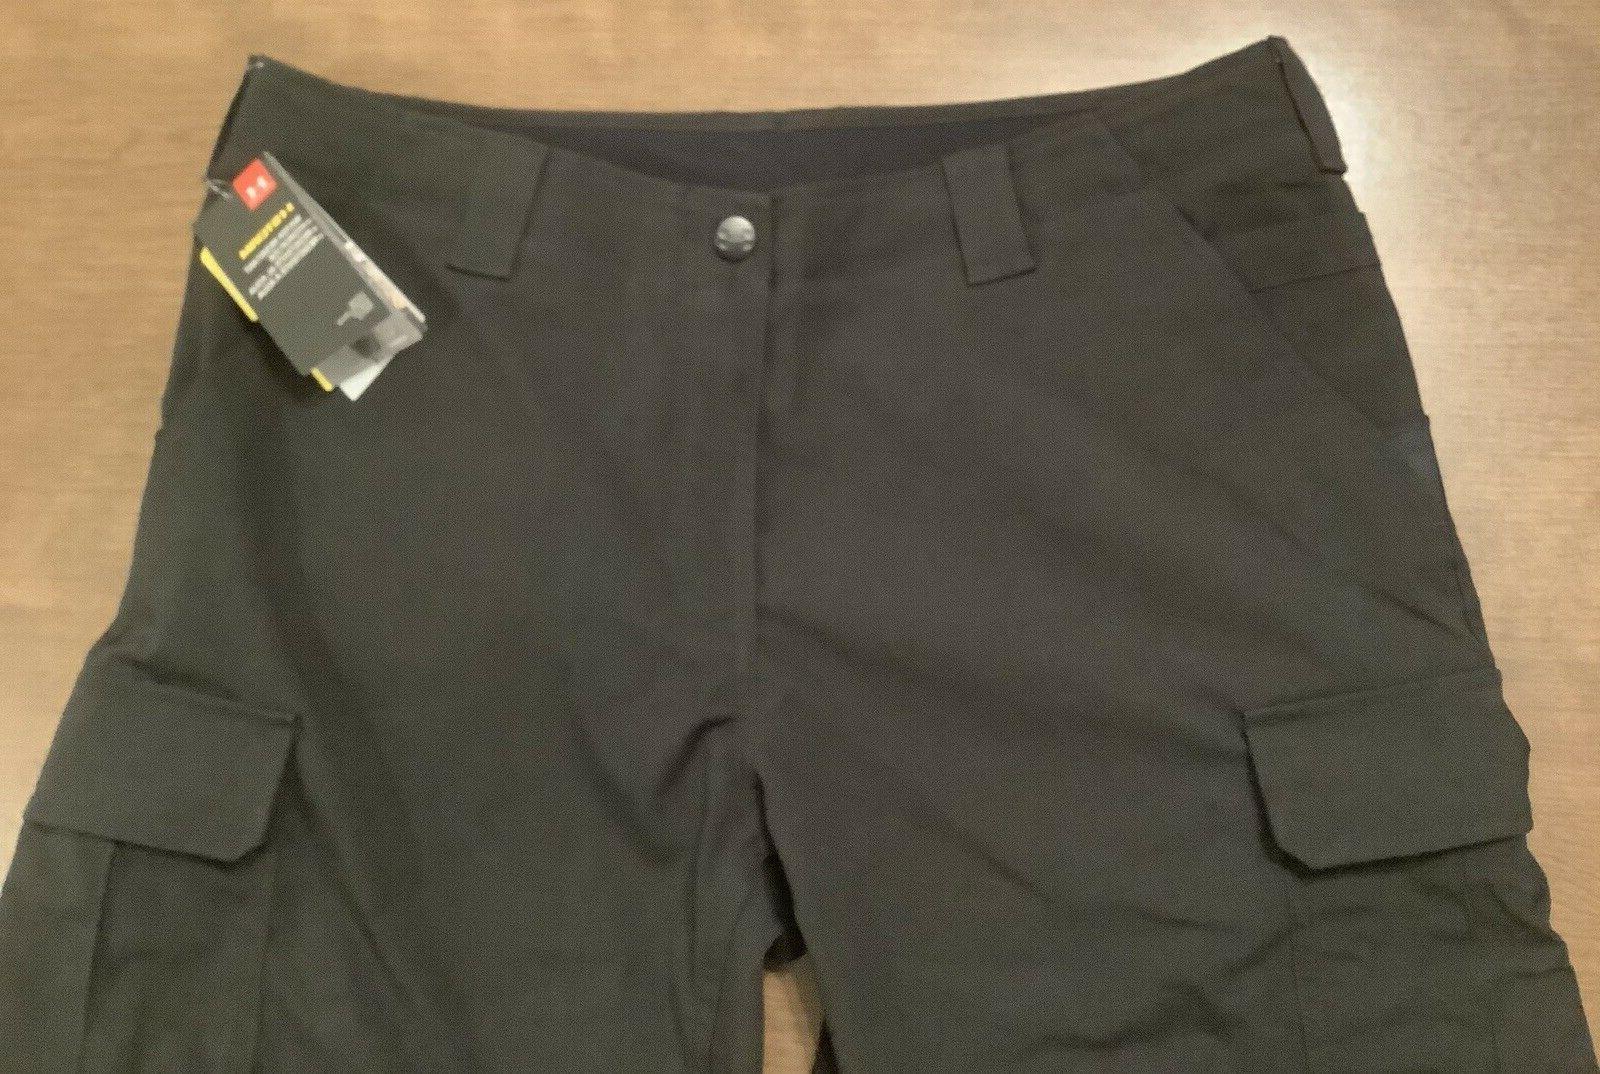 Under Men's UA Pants 1265491 Black 40x32 NWT